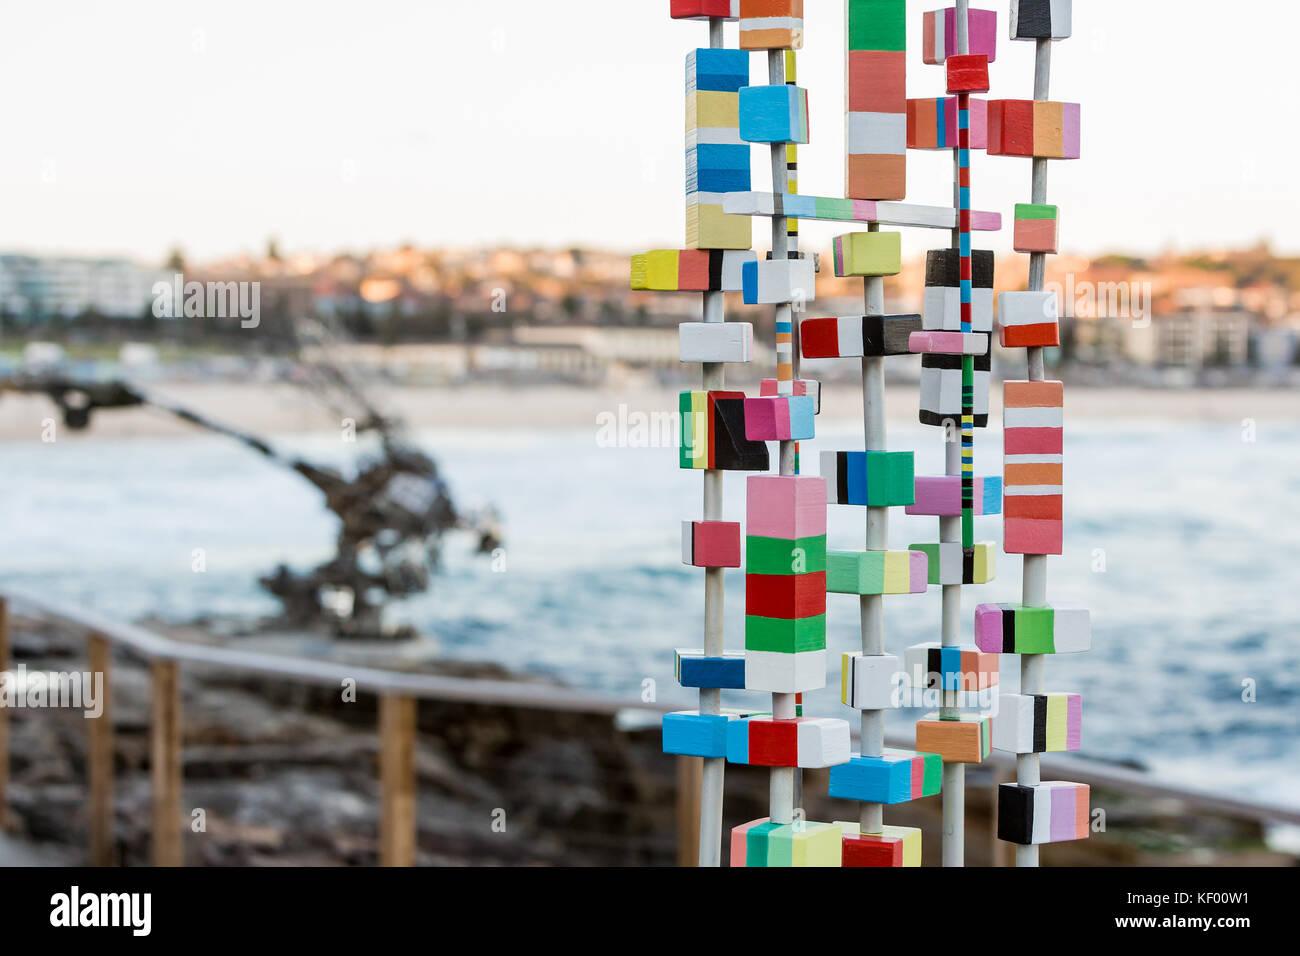 Mega Pixel Stock Photos & Mega Pixel Stock Images - Alamy